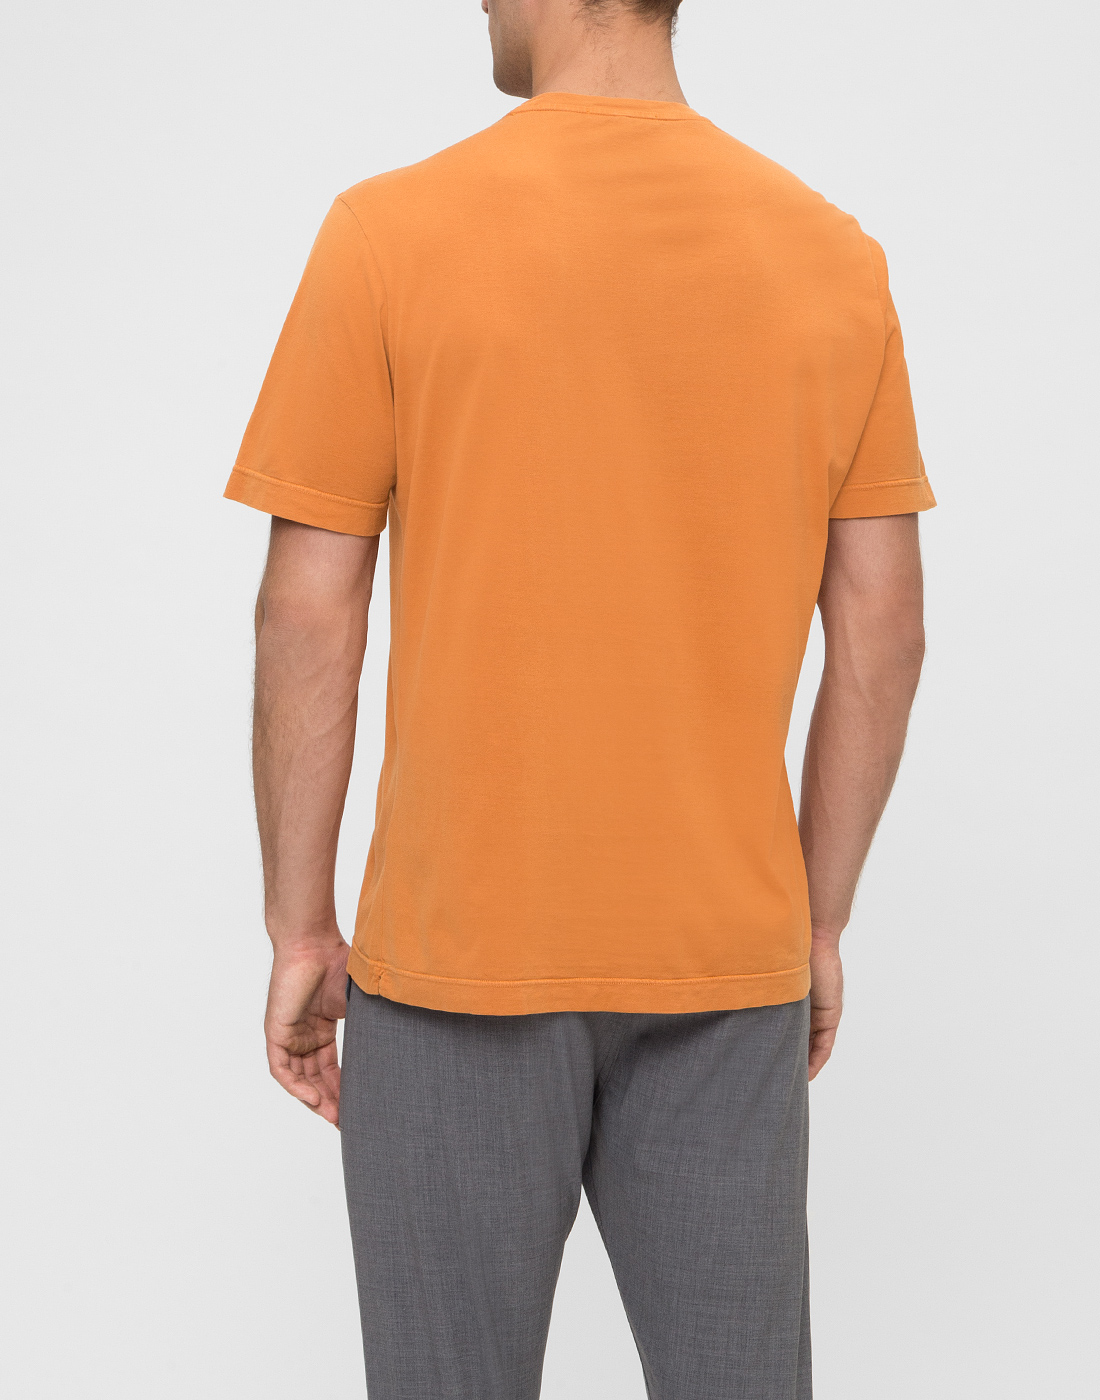 Мужская оранжевая футболка Capobianco S4M660.AL01 ARANCIONE-4